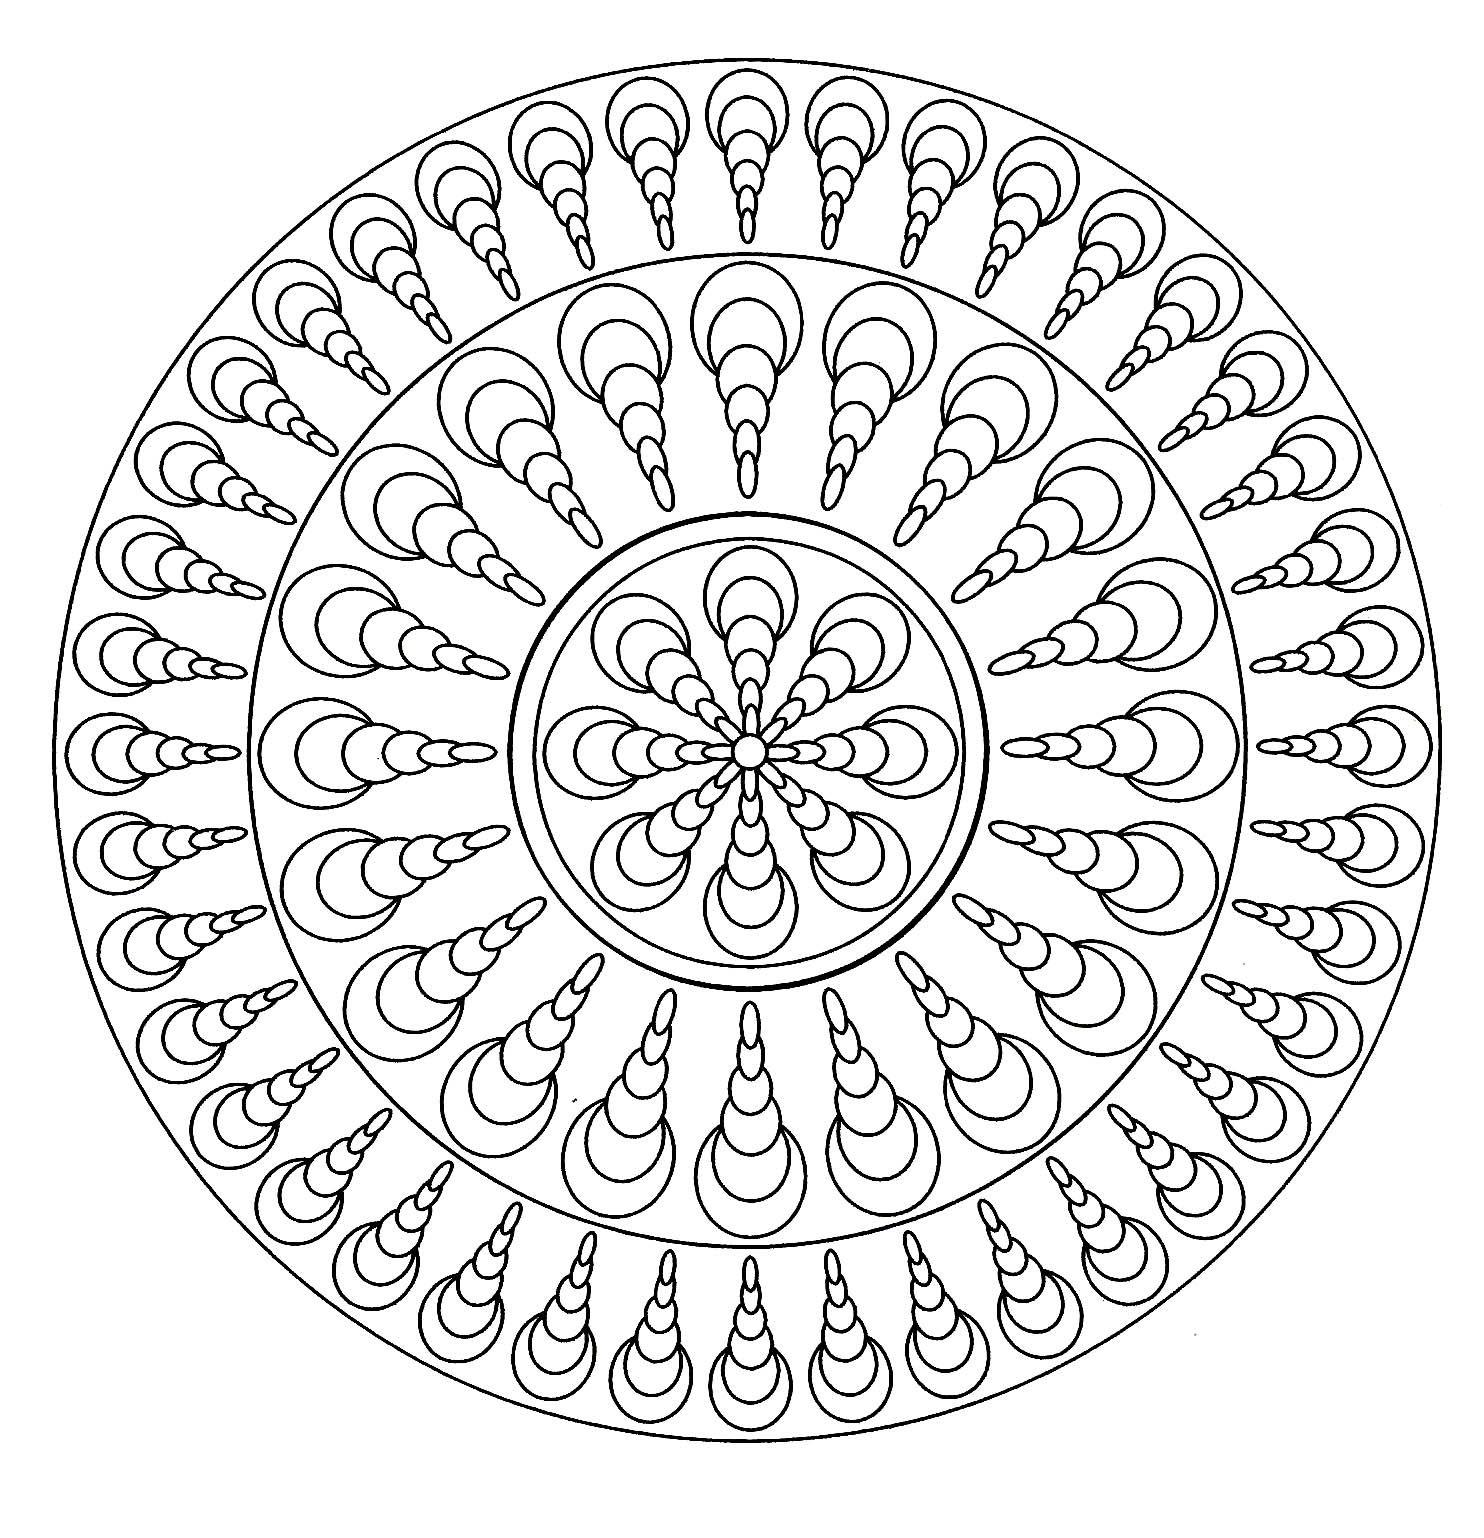 Mandala Facile 4 A Partir De La Galerie Normal Mandala Malvorlagen Einfaches Mandala Mandala Zum Ausdrucken